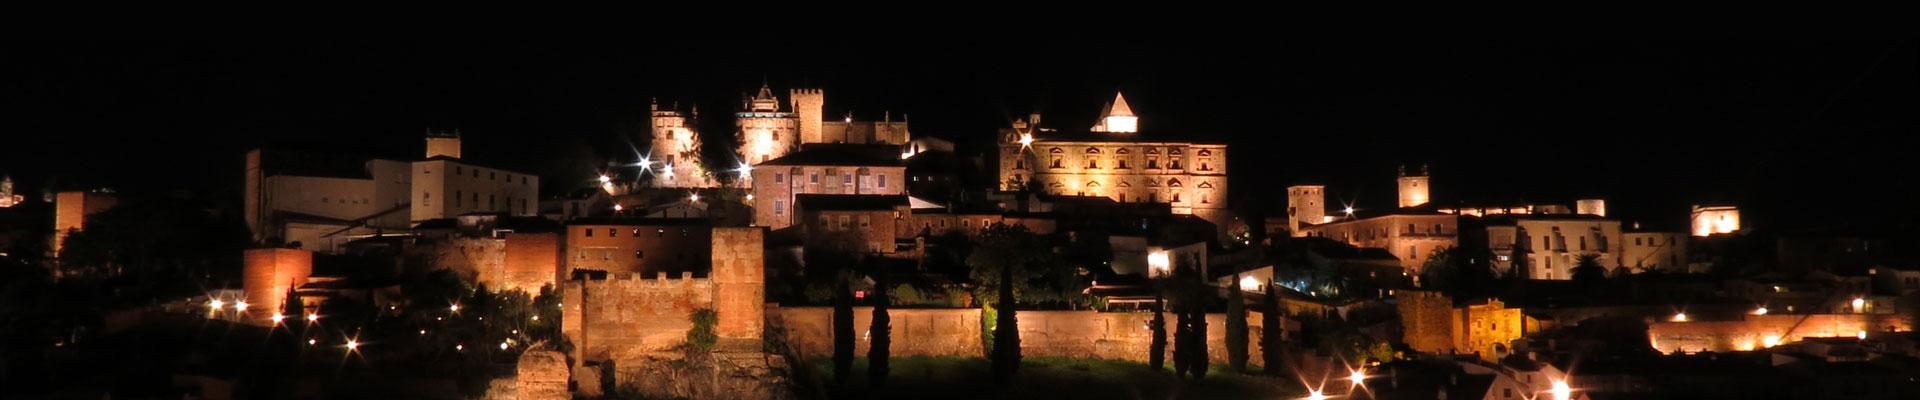 Vista de Cáceres Nocturna